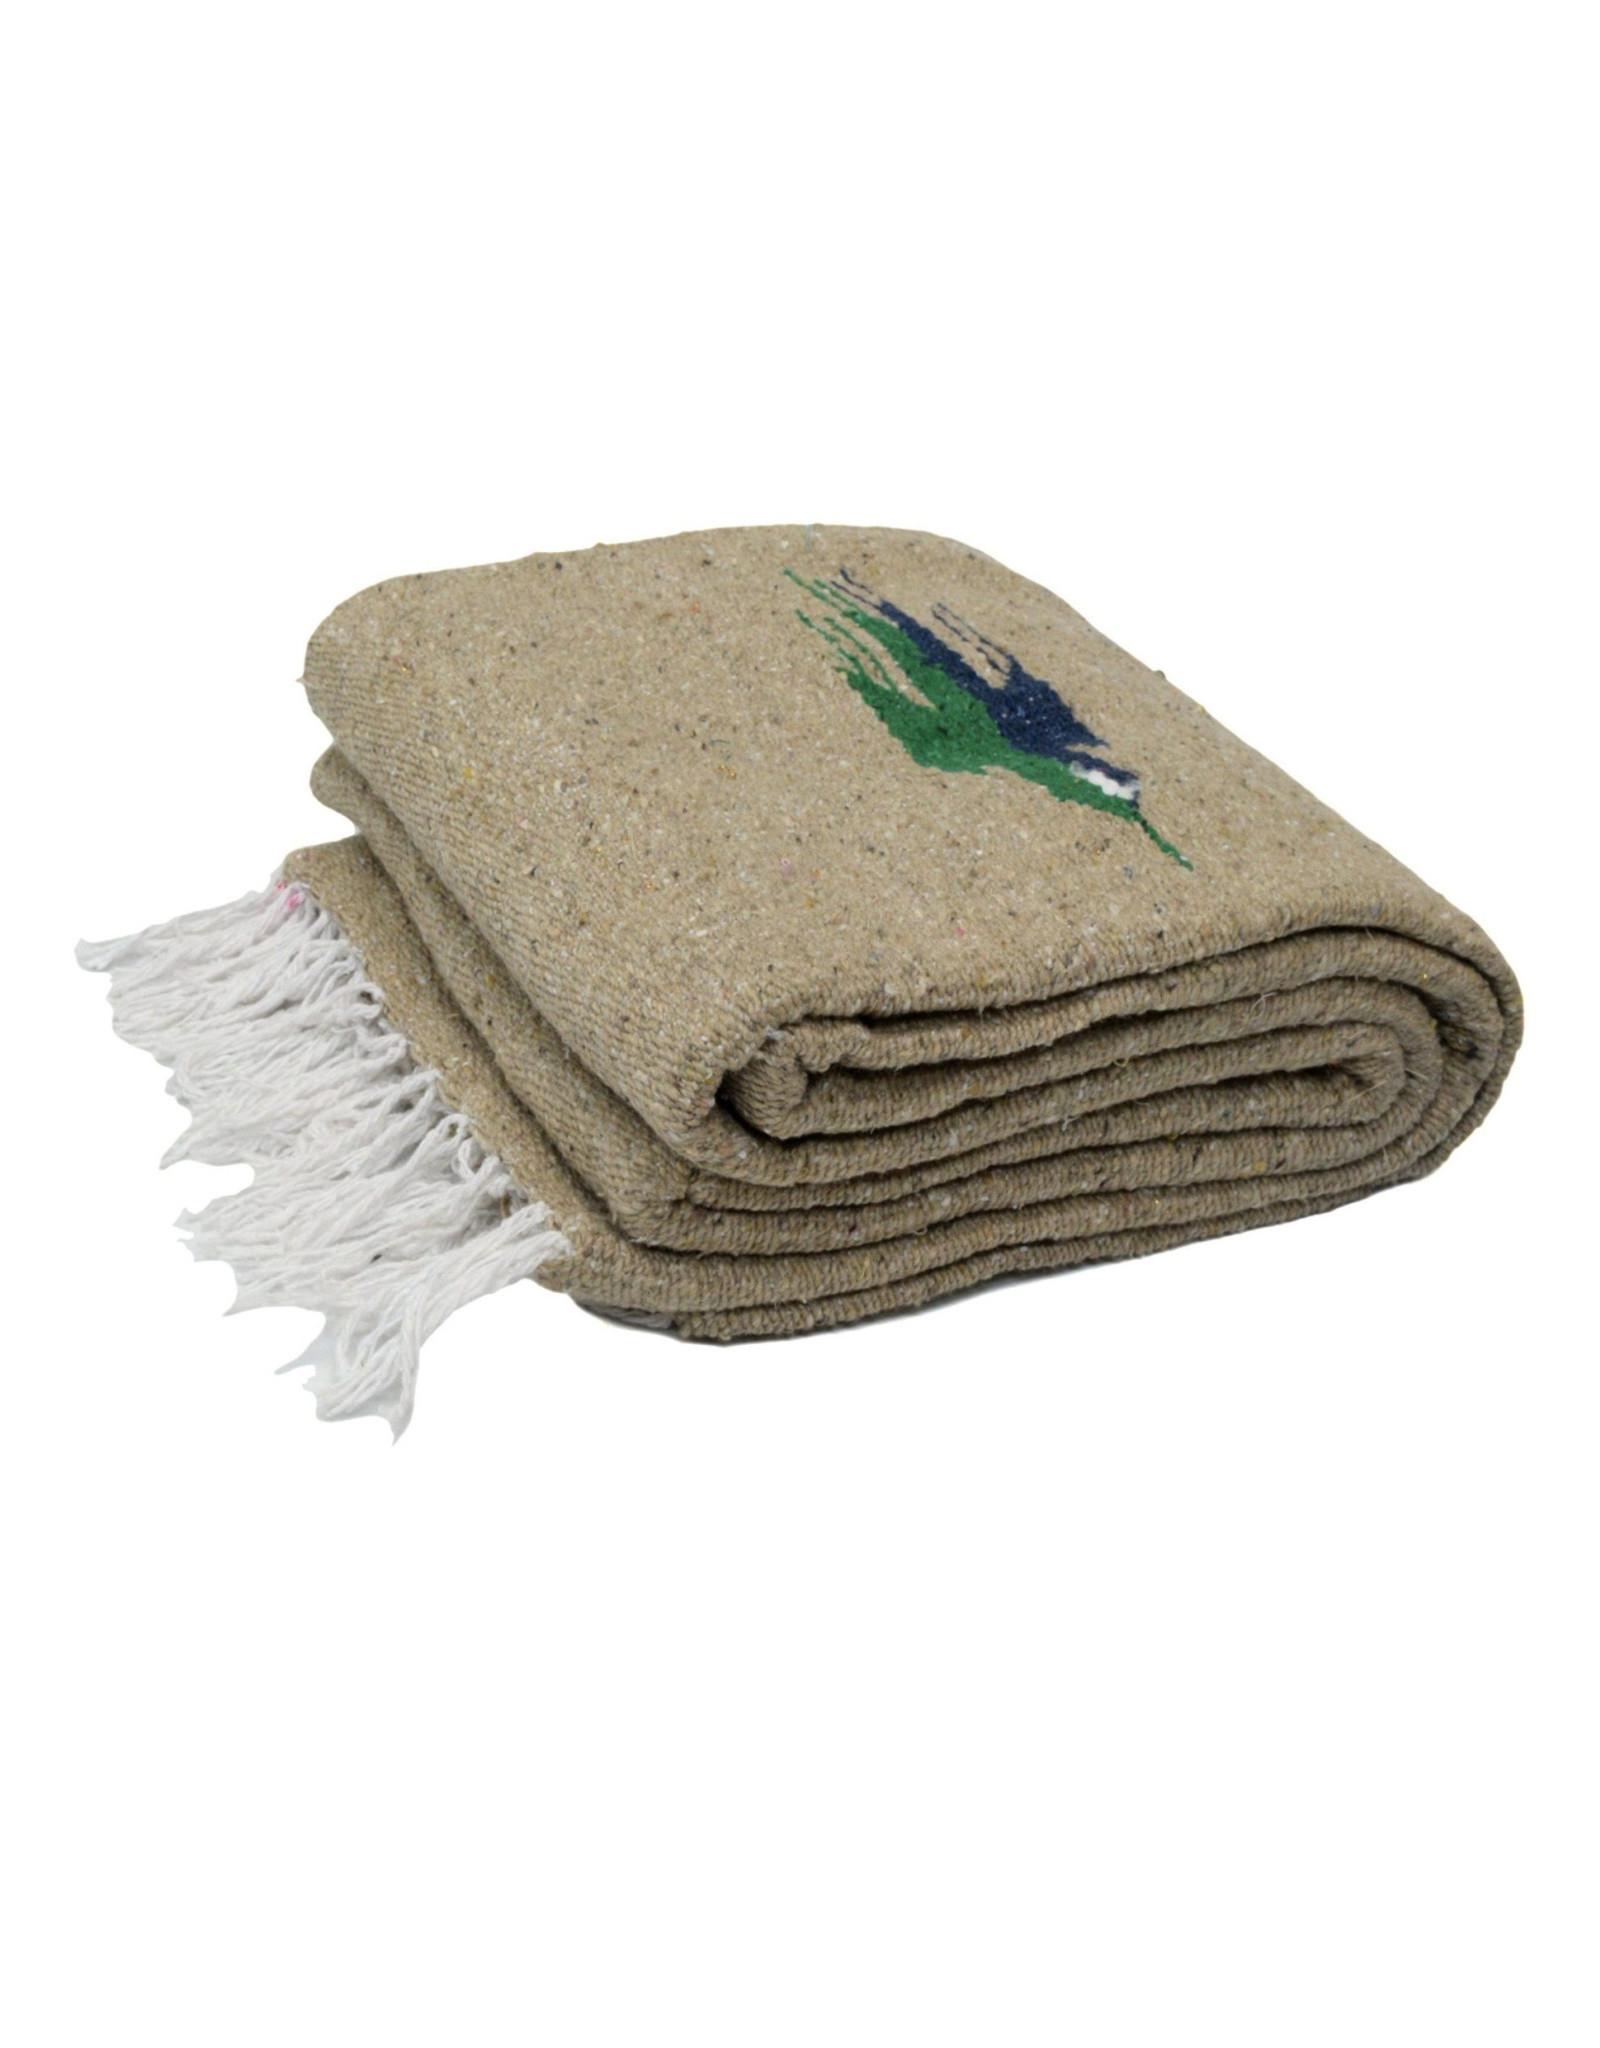 West Path Baja Thunderbird Blanket - Sandstone